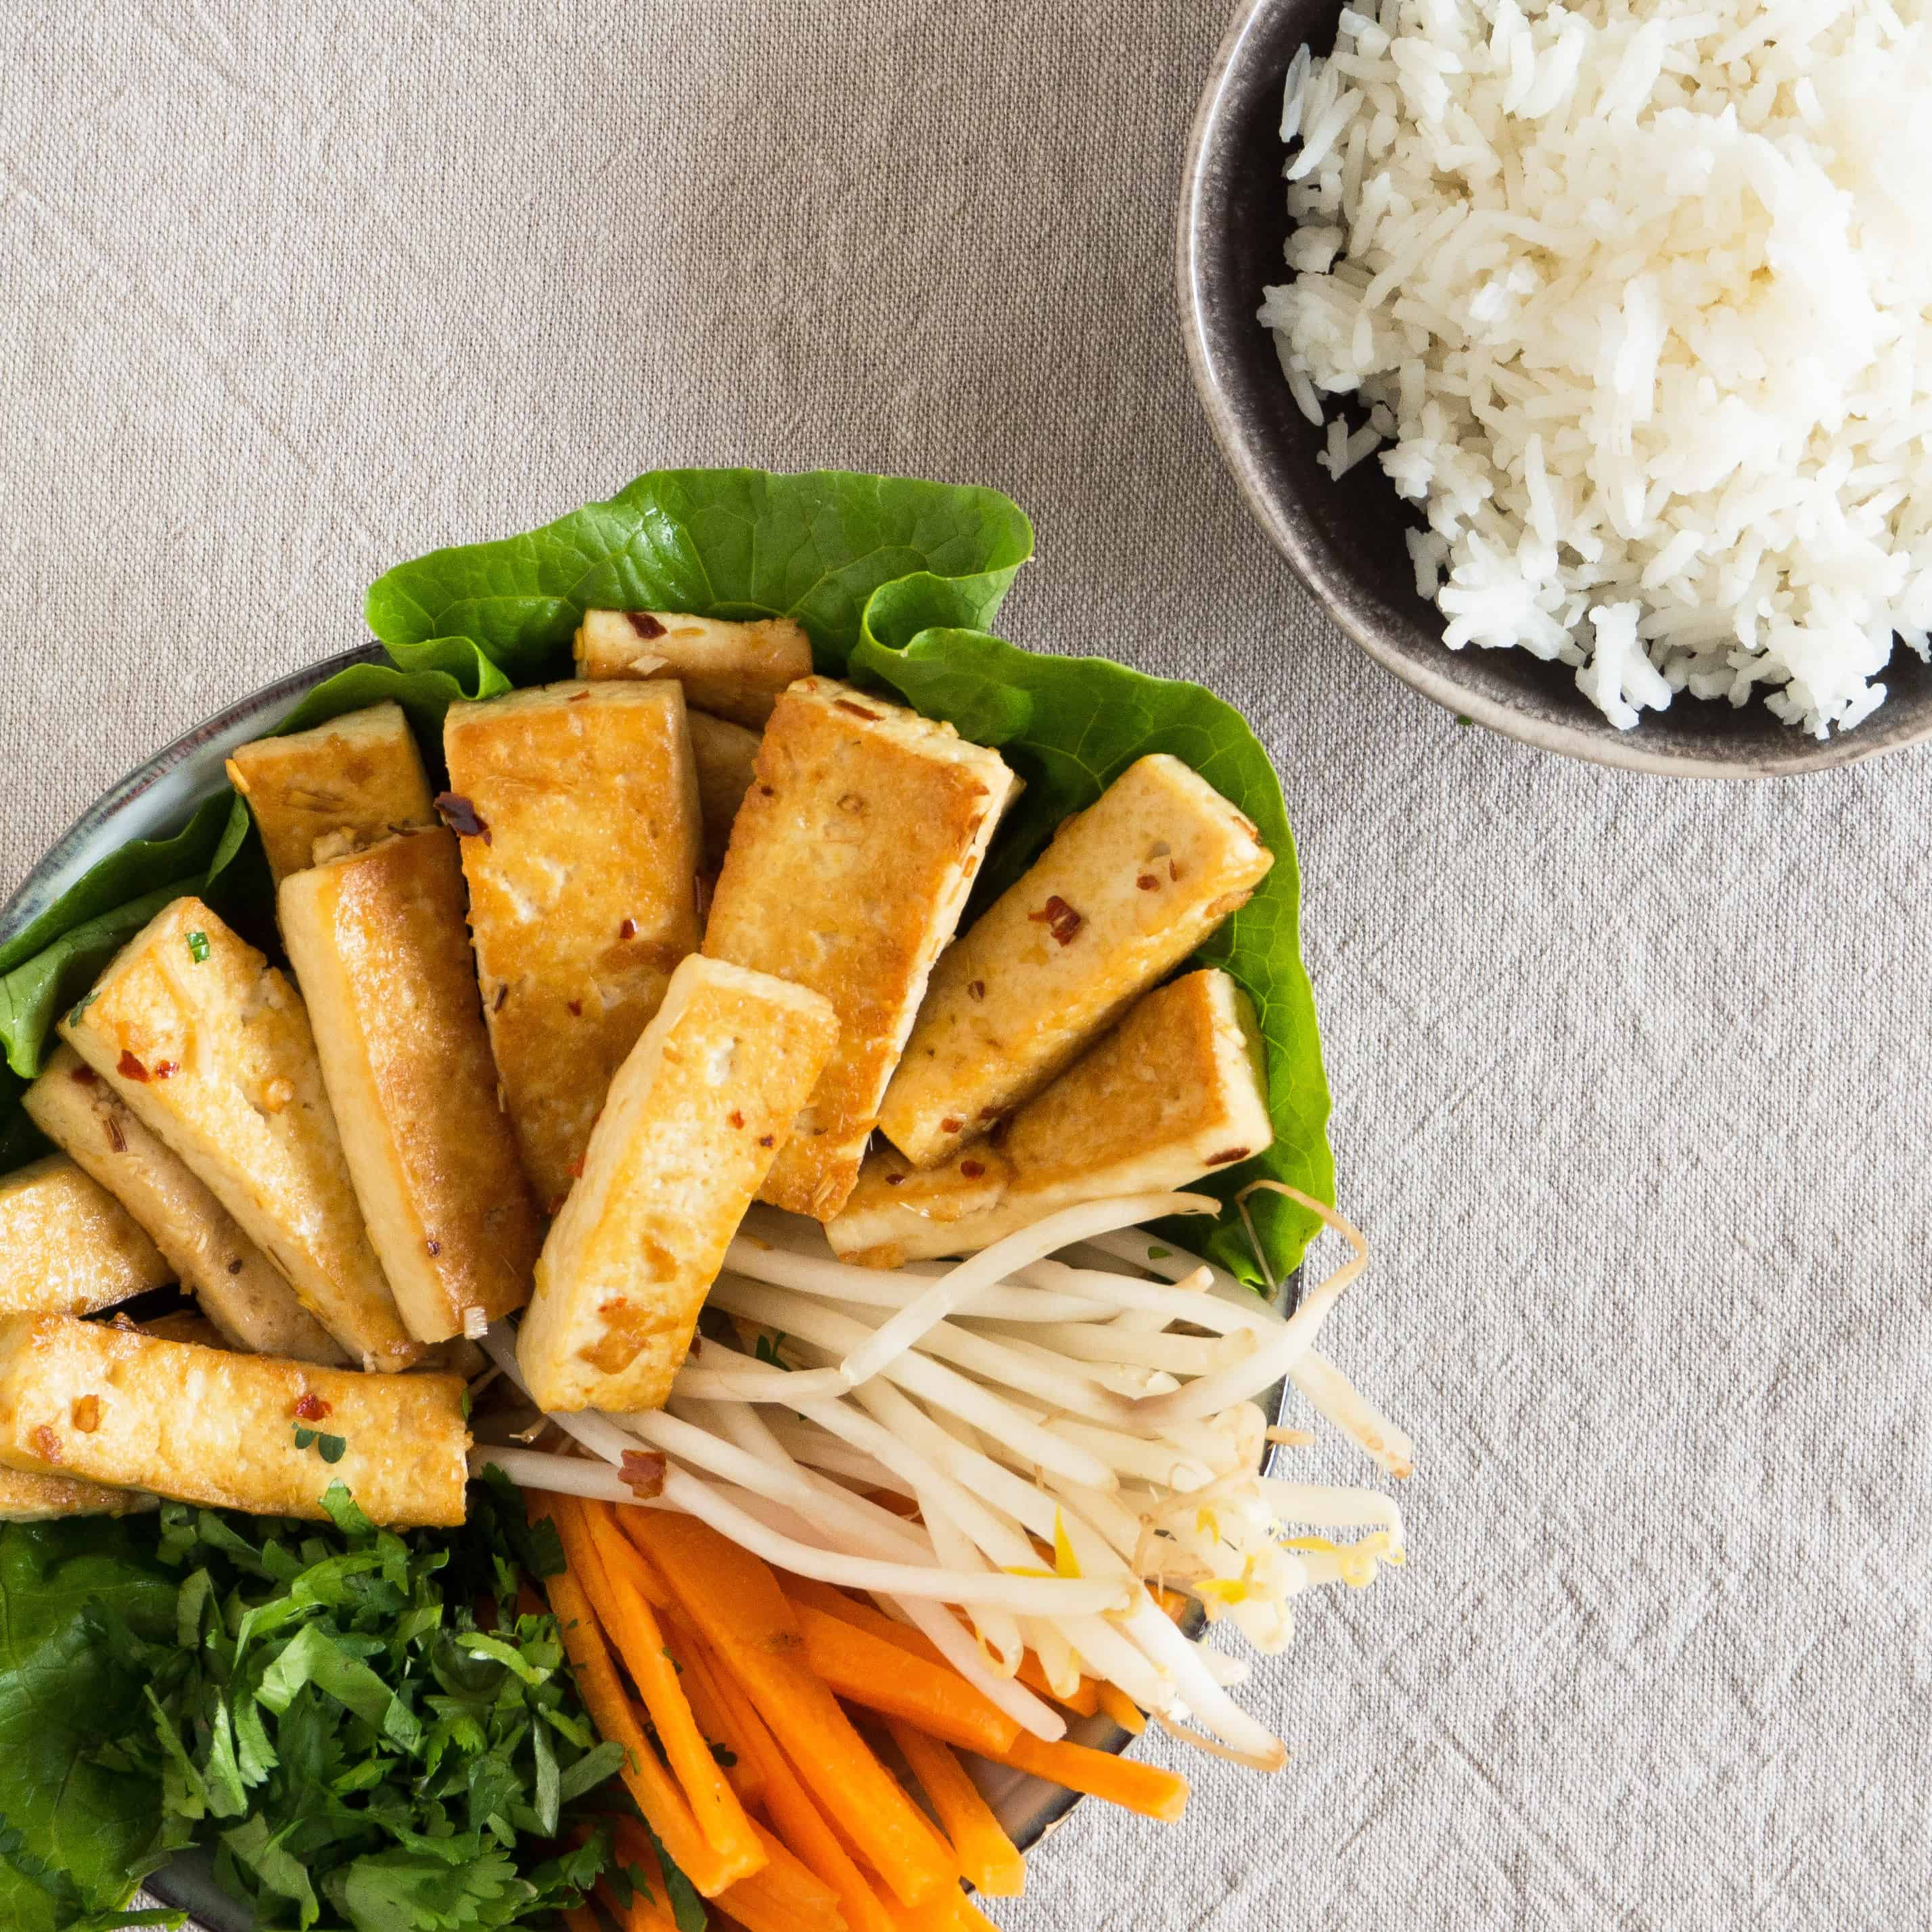 Lemongrass Tofu Bowl - served with plain rice.